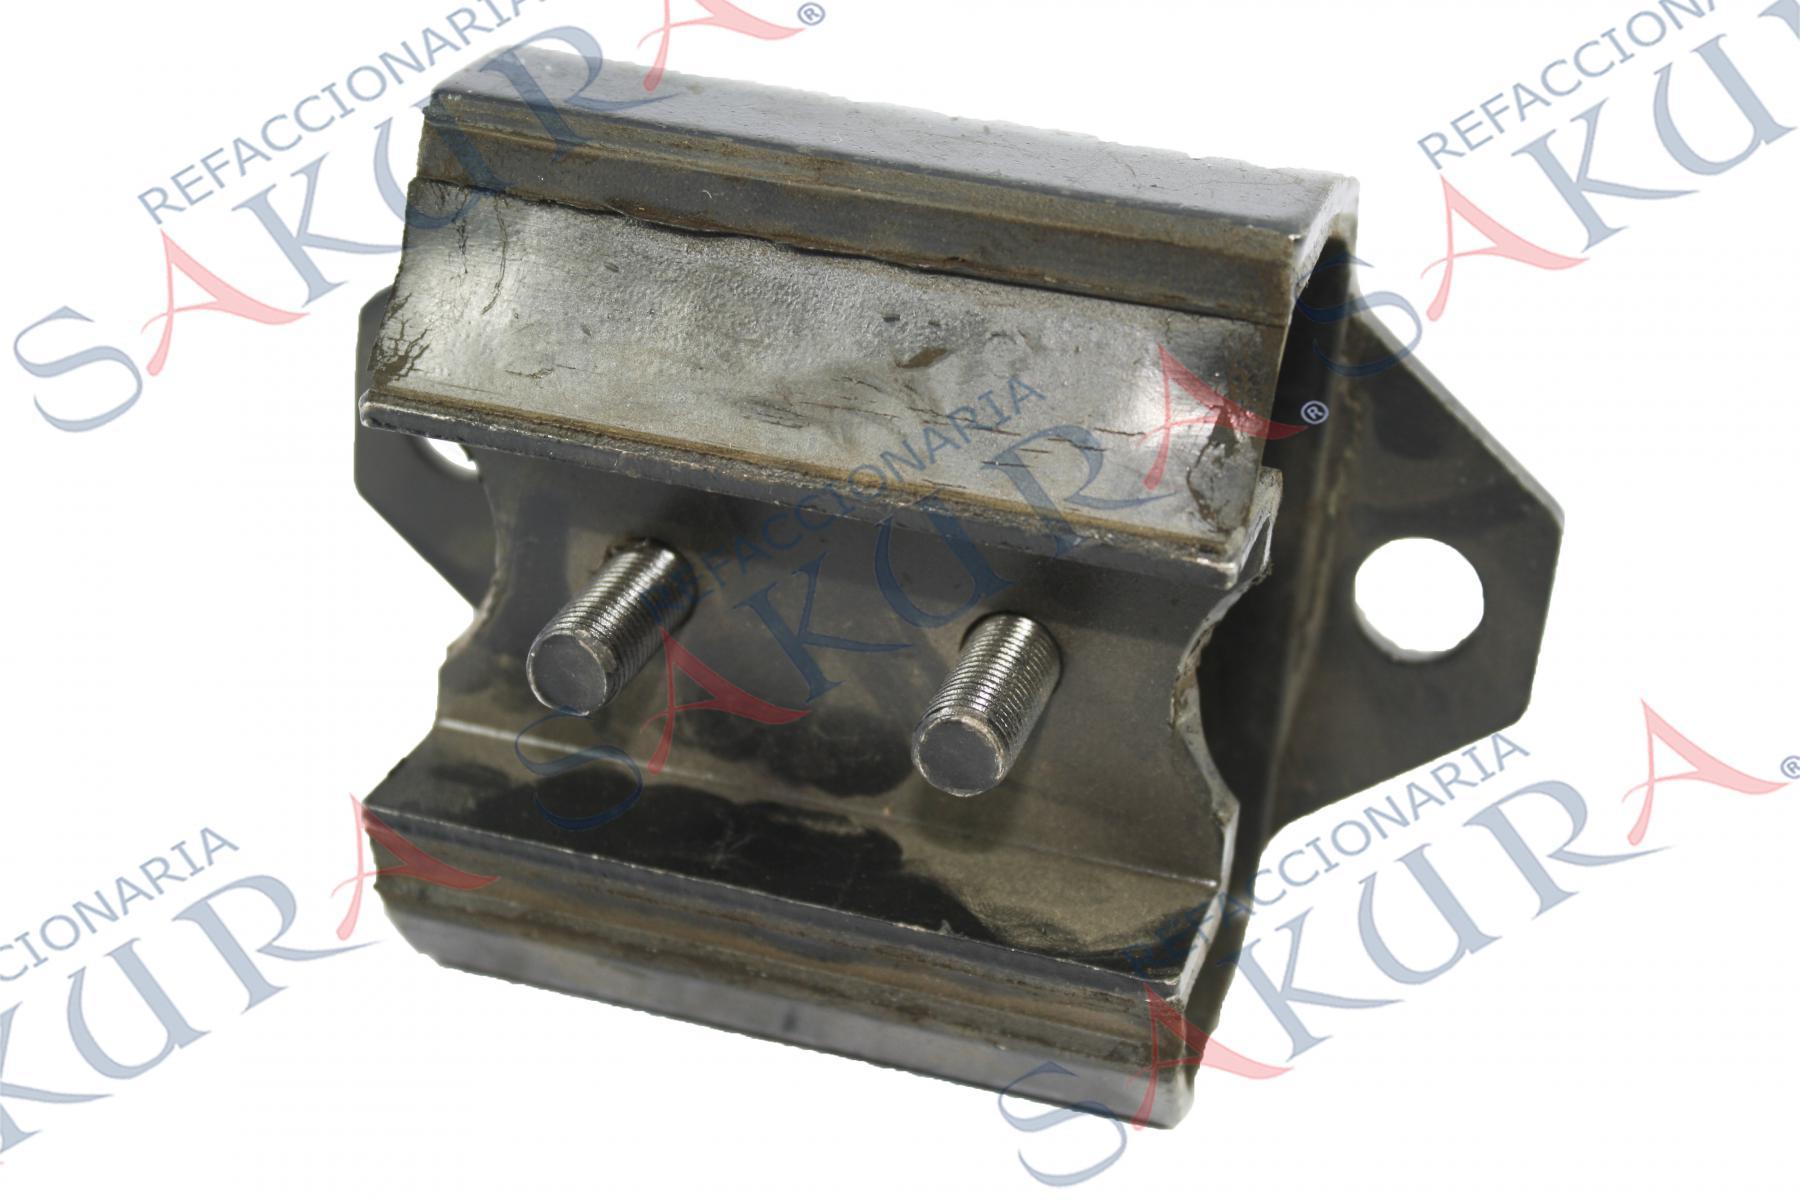 11320-F4010, Soporte Caja Velocidades  (Safety)